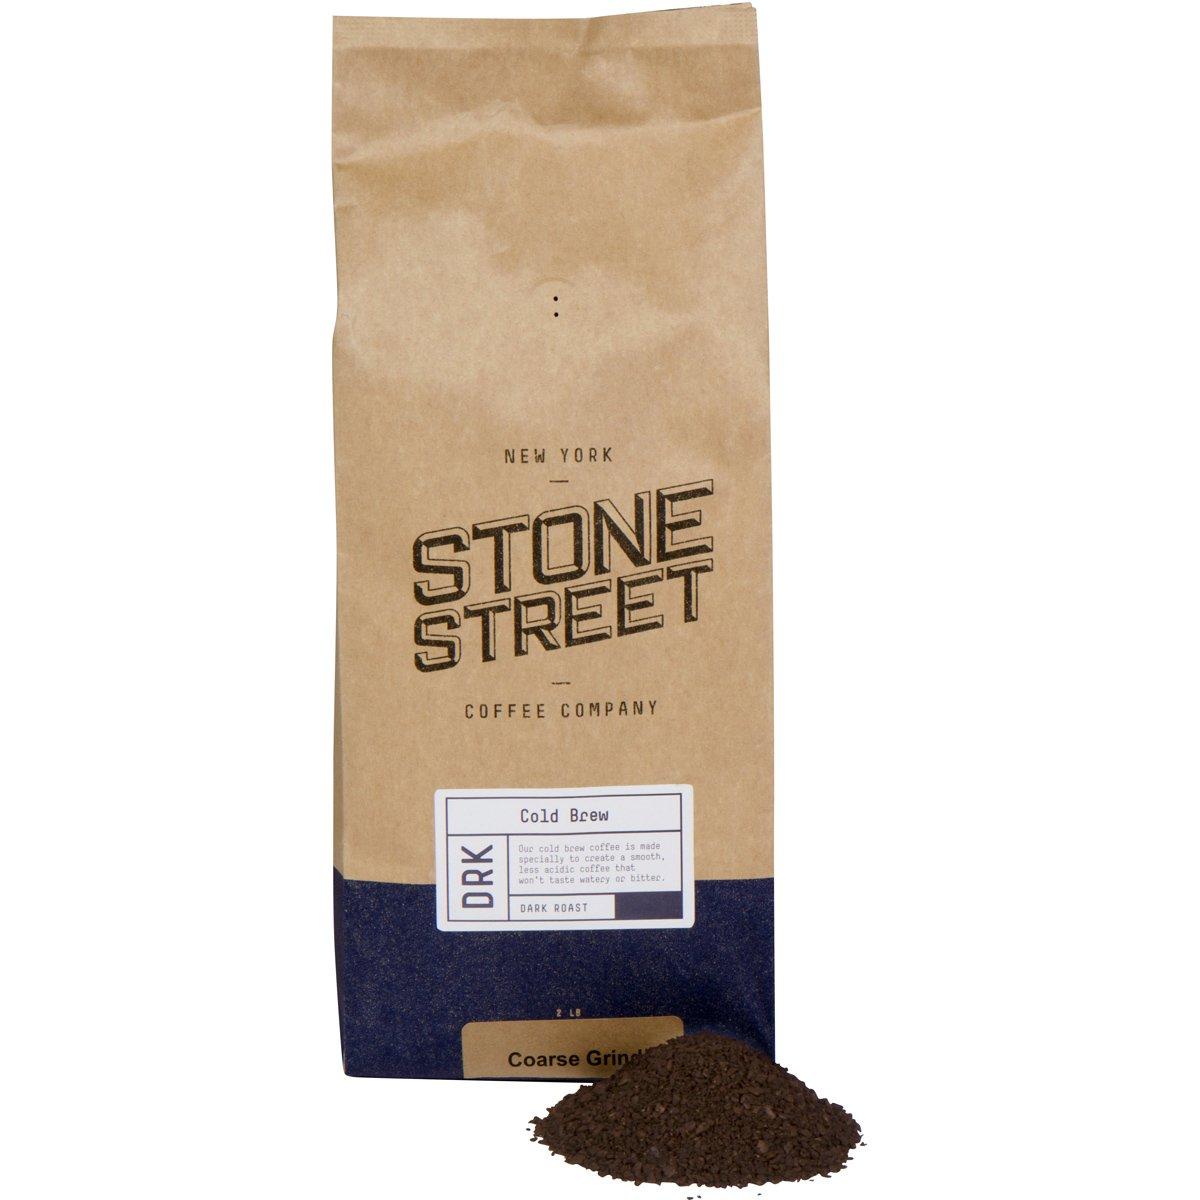 Cold Brew Reserve Coarse Ground Coffee - 2 lb. Bag - Dark Roast - Colombia Arabica Single Origin by Stone Street Coffee